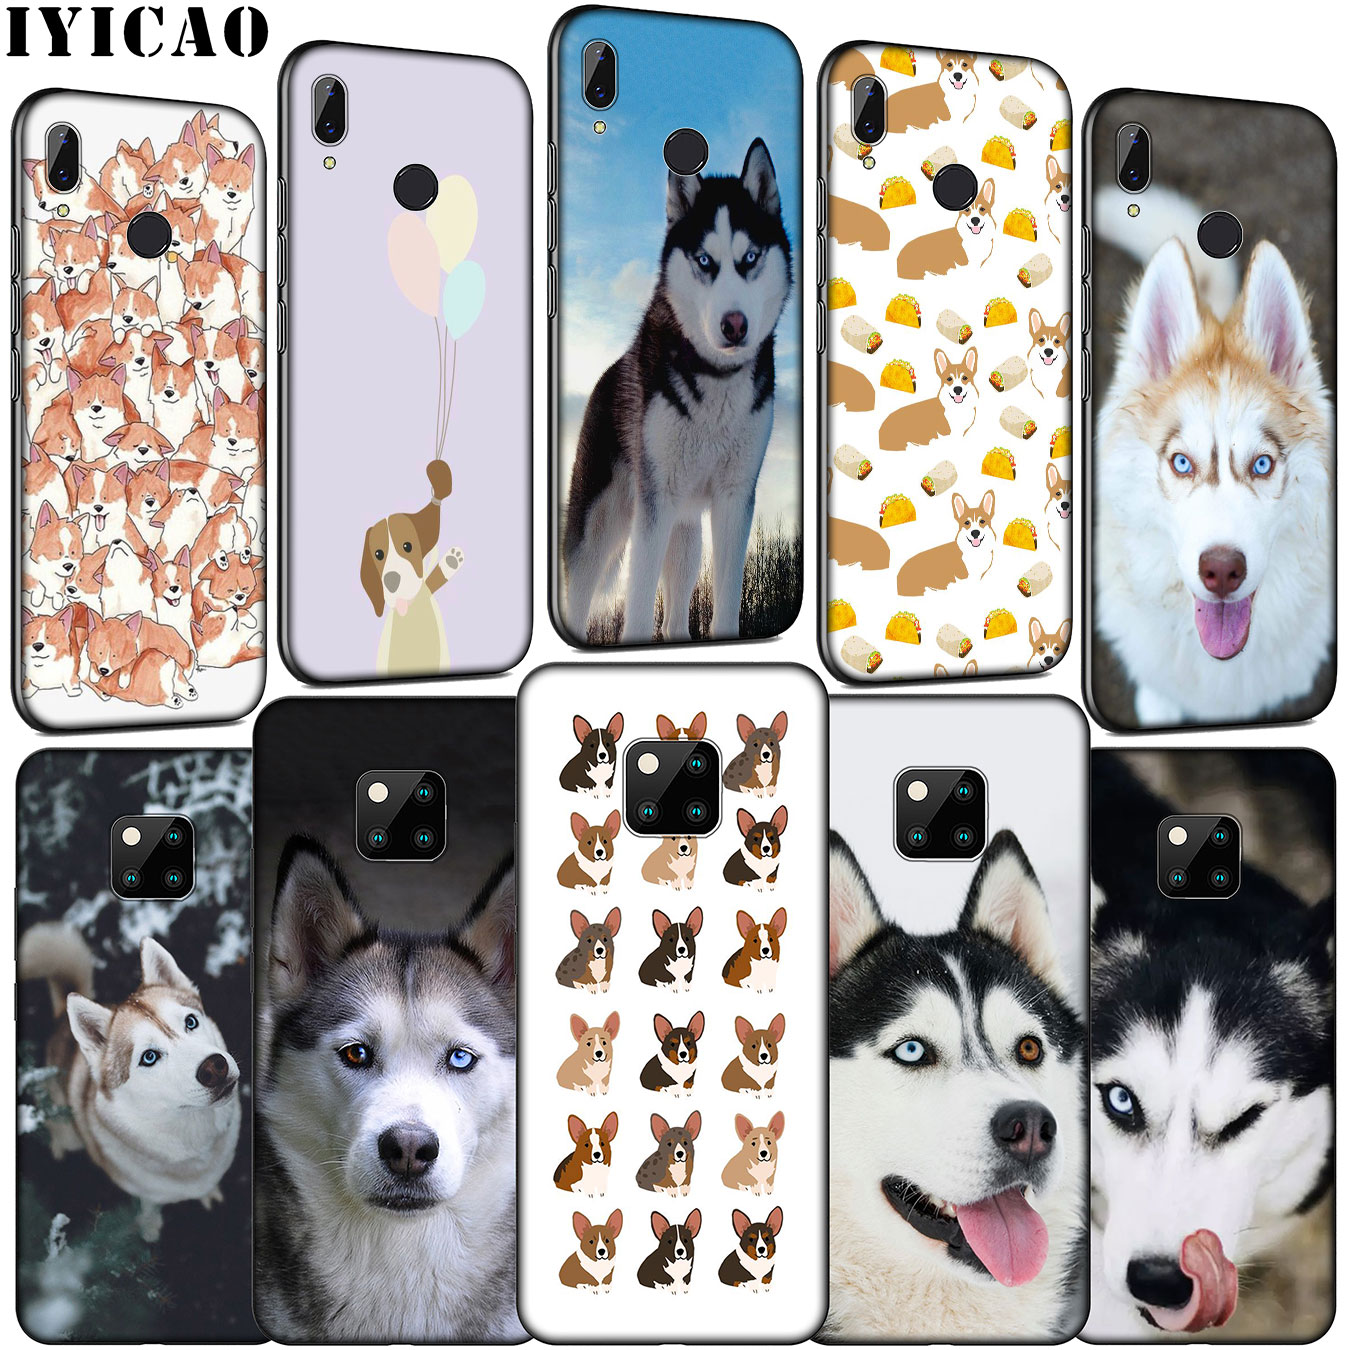 IYICAO perro Husky Corgi suave silicona teléfono caso para Huawei Mate 30 20 10 Pro Nova 5i 4 3 3i 2i 2 Lite negro cubierta